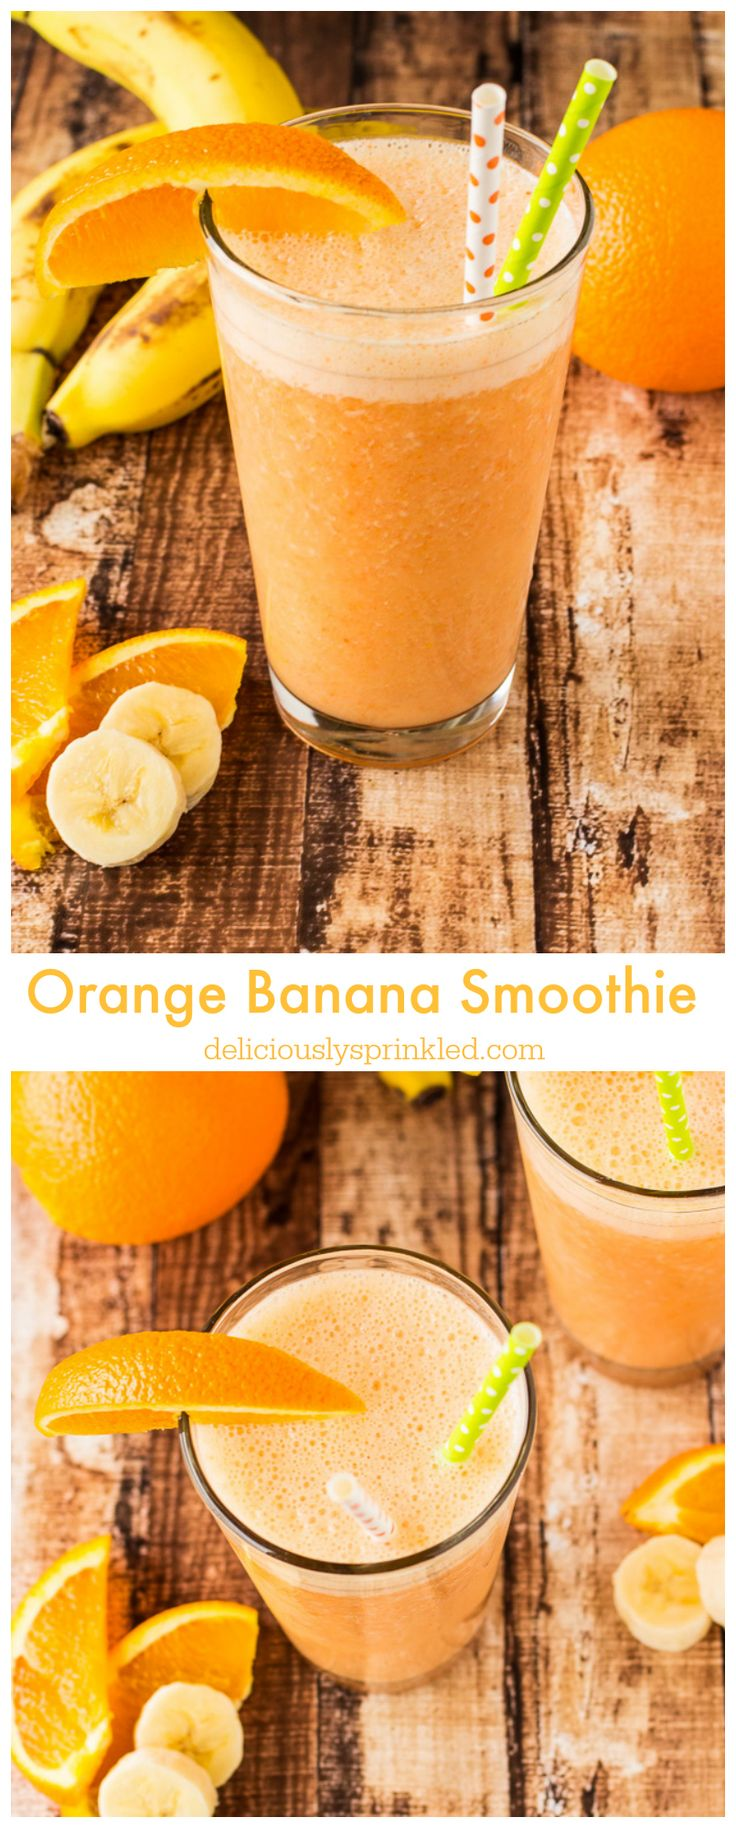 Orange Banana Smoothie | Deliciously Sprinkled